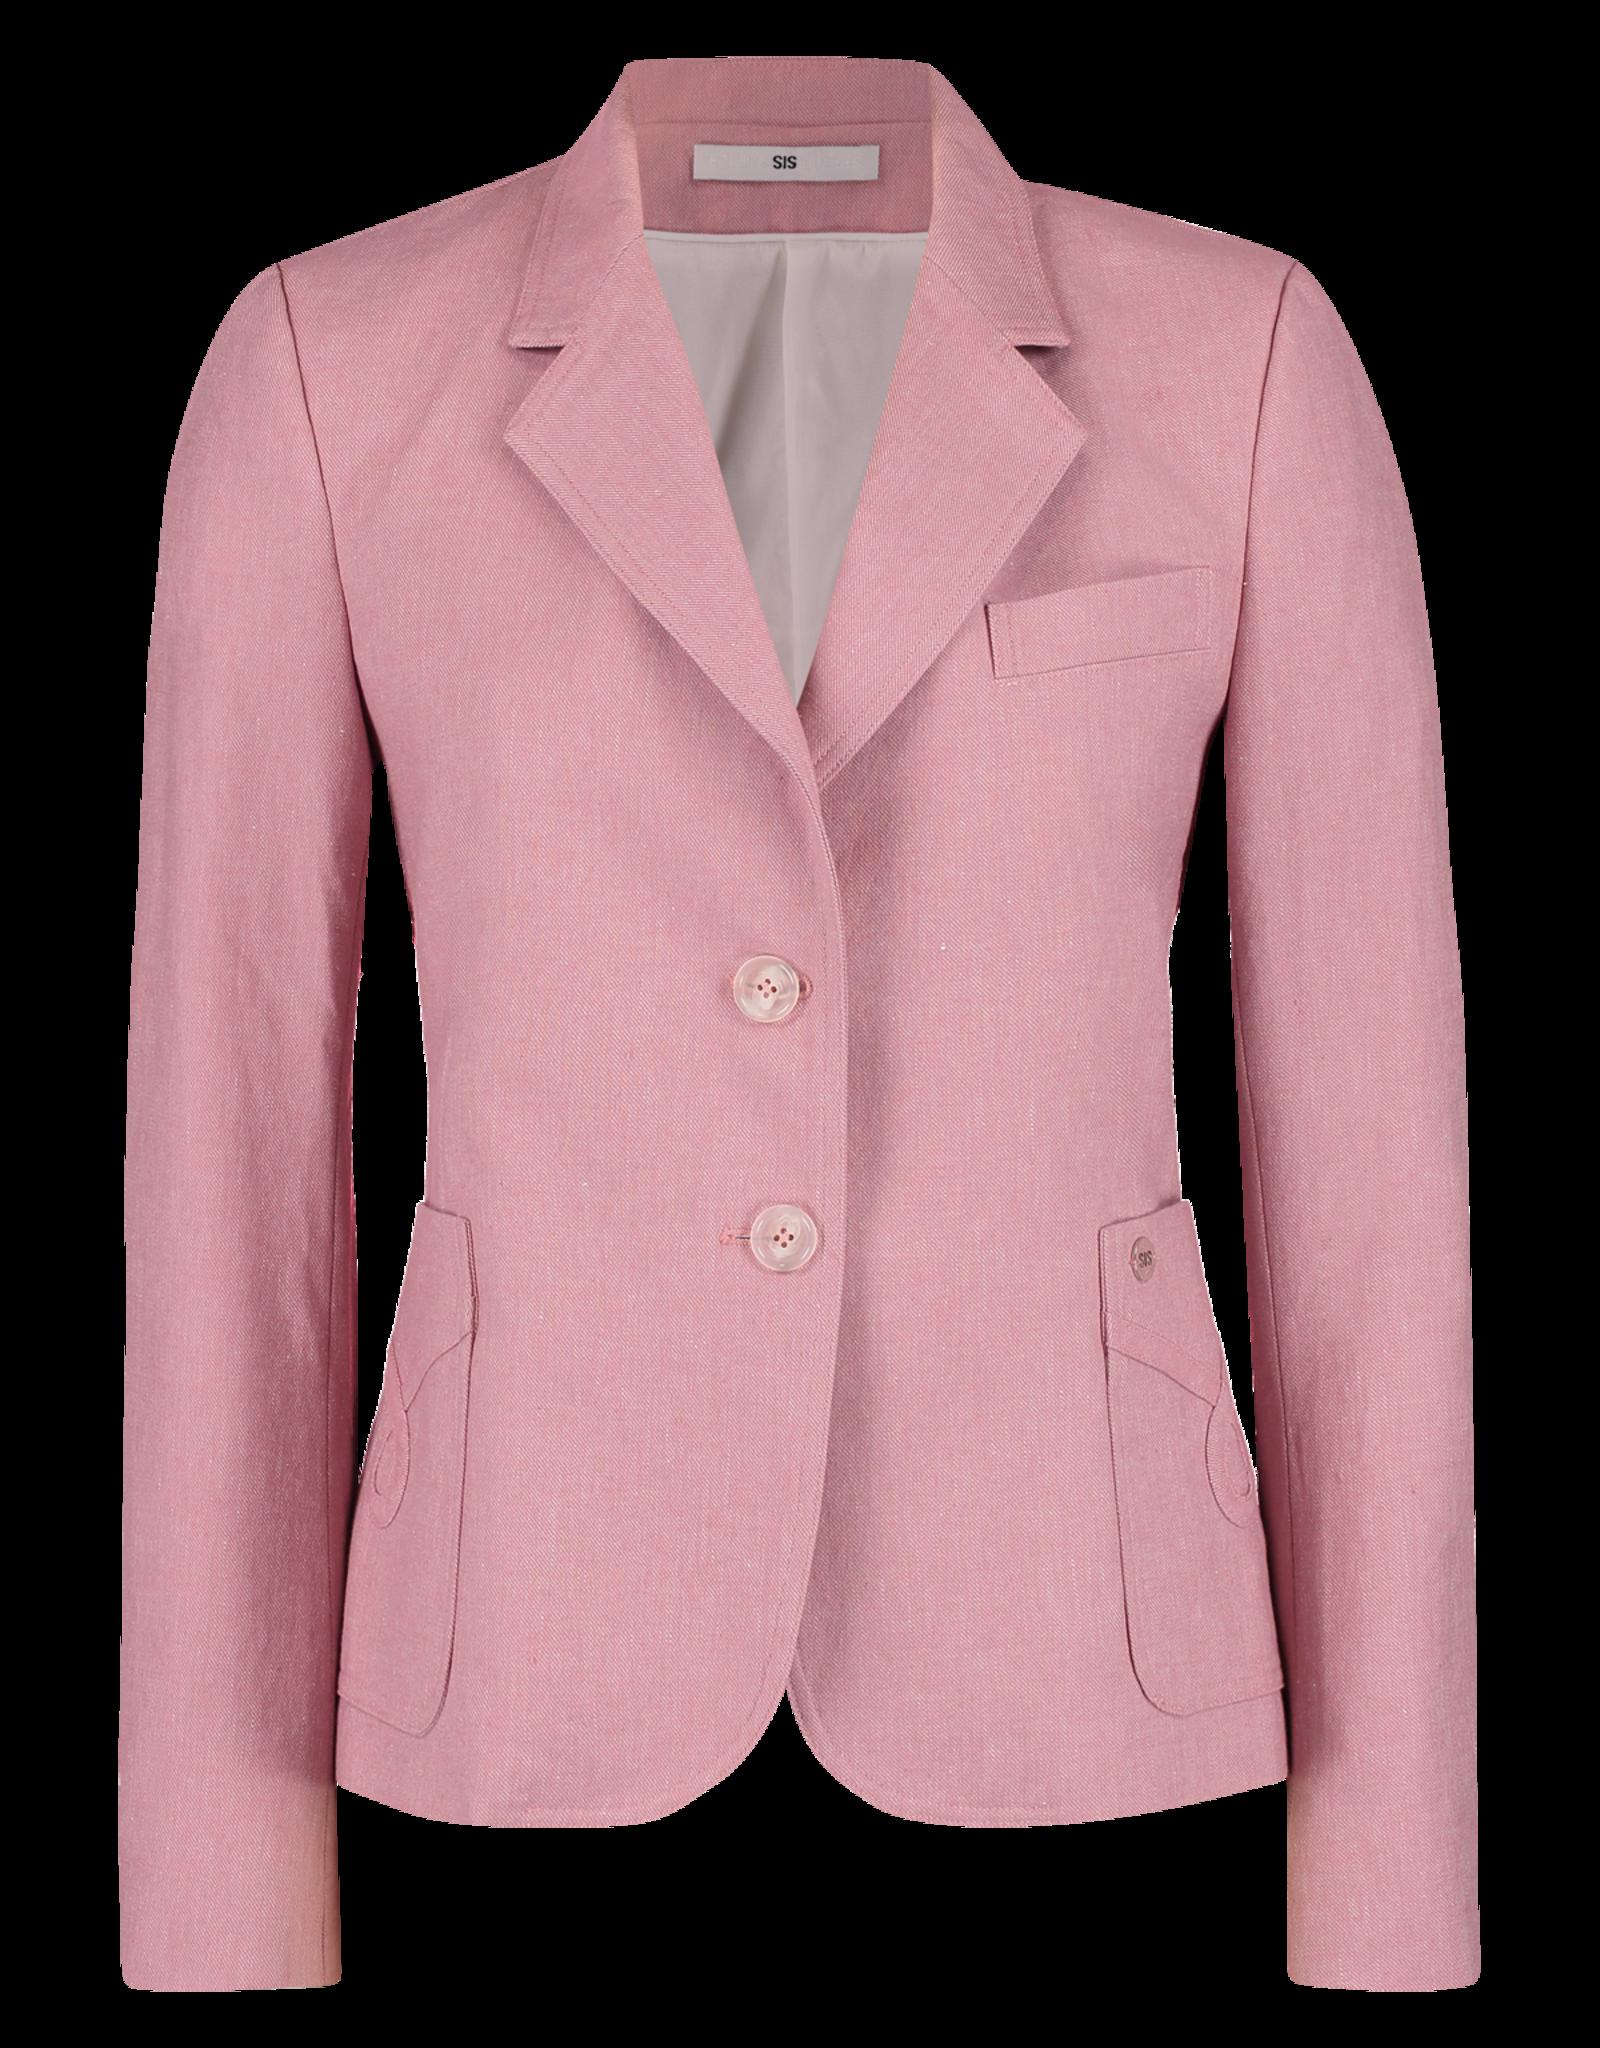 AW1920 406-R Sailor Jacket